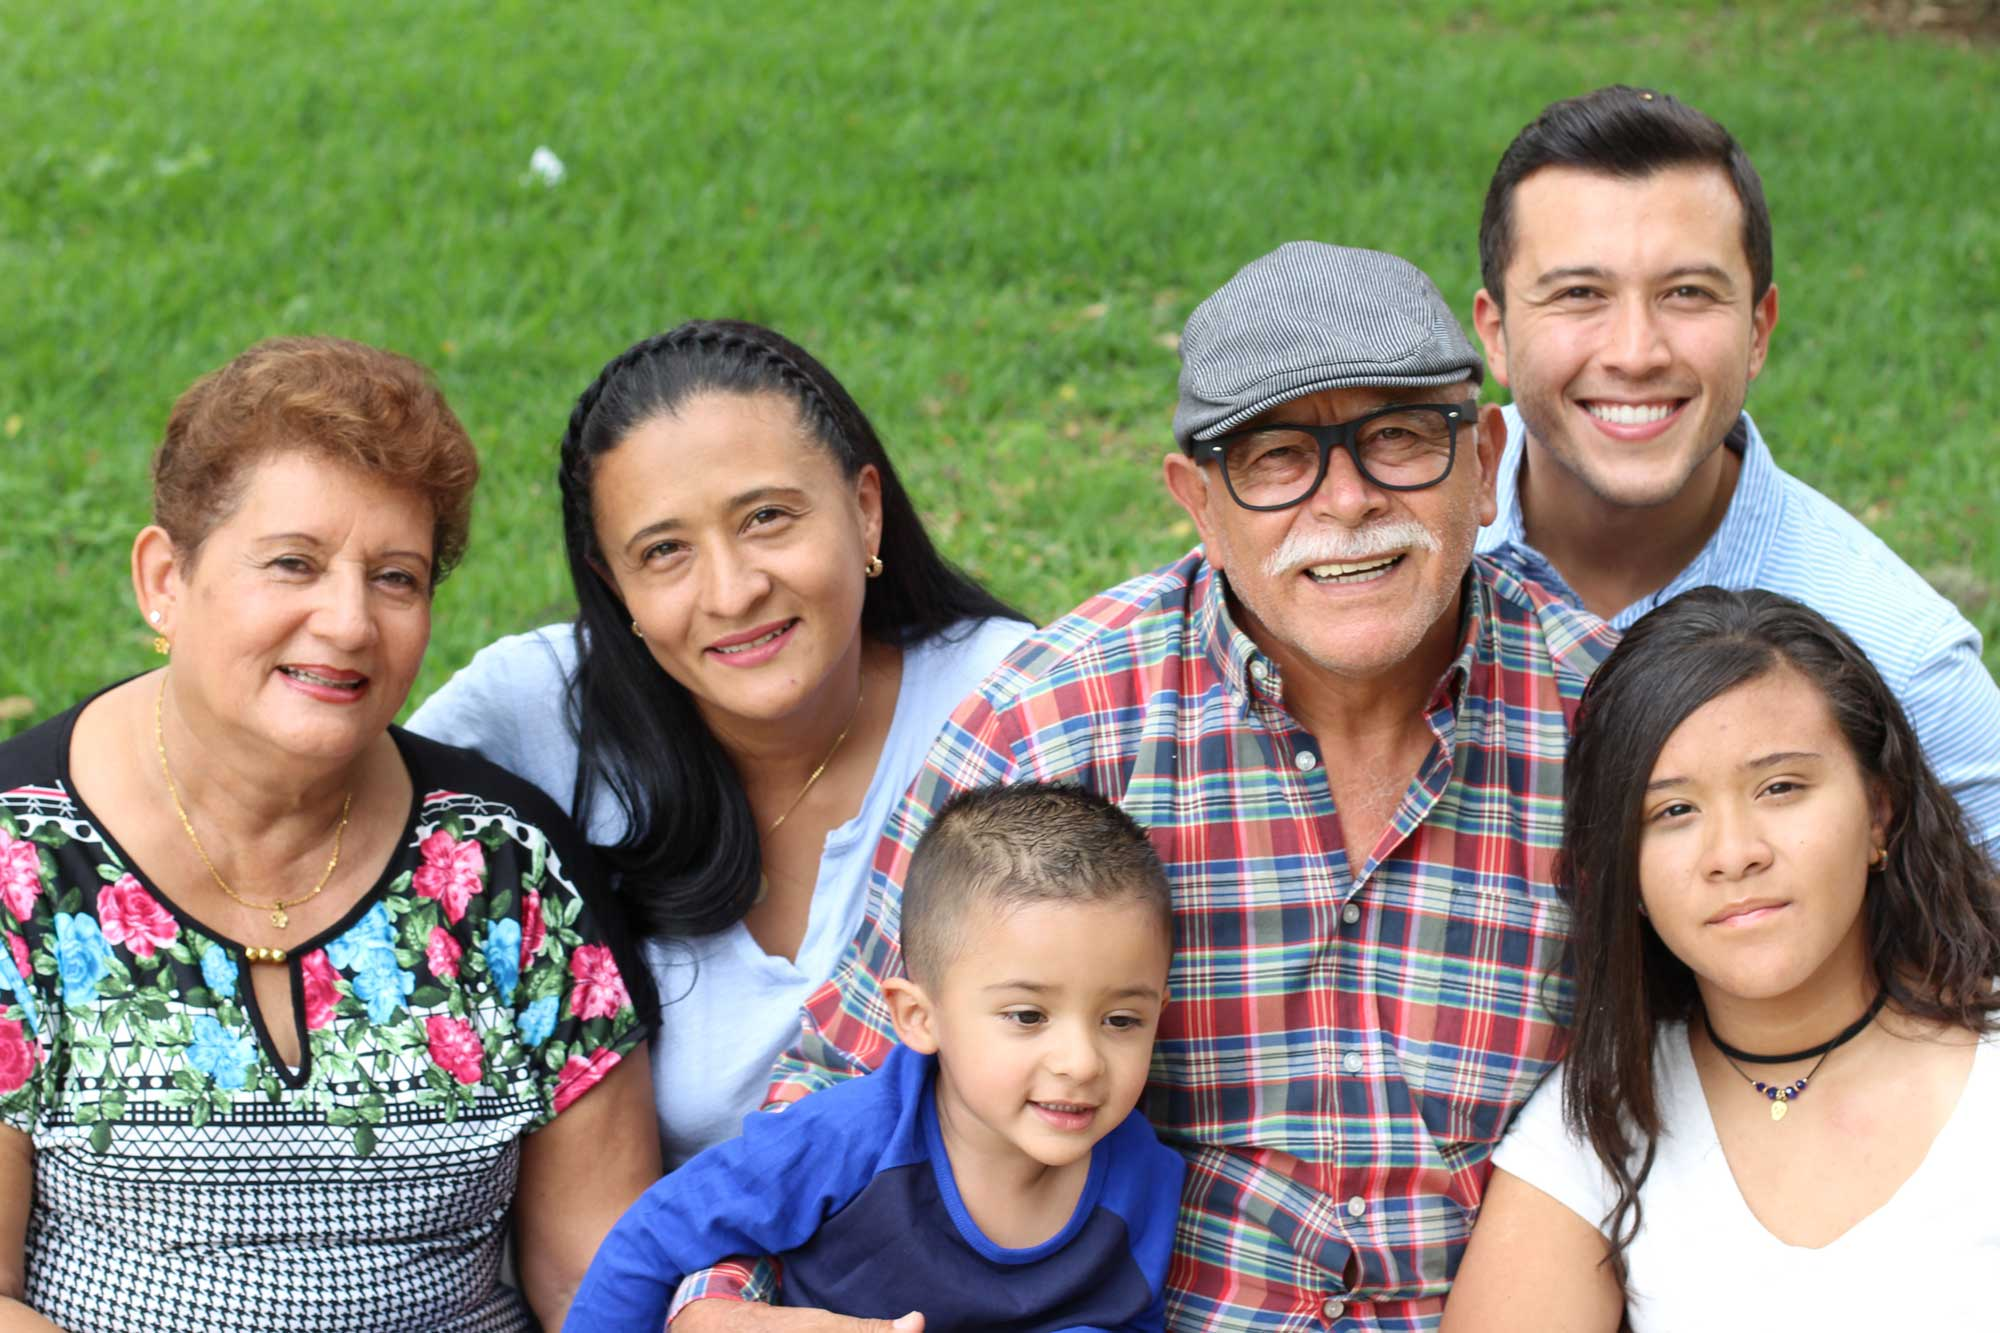 photo - Multi-generation Family